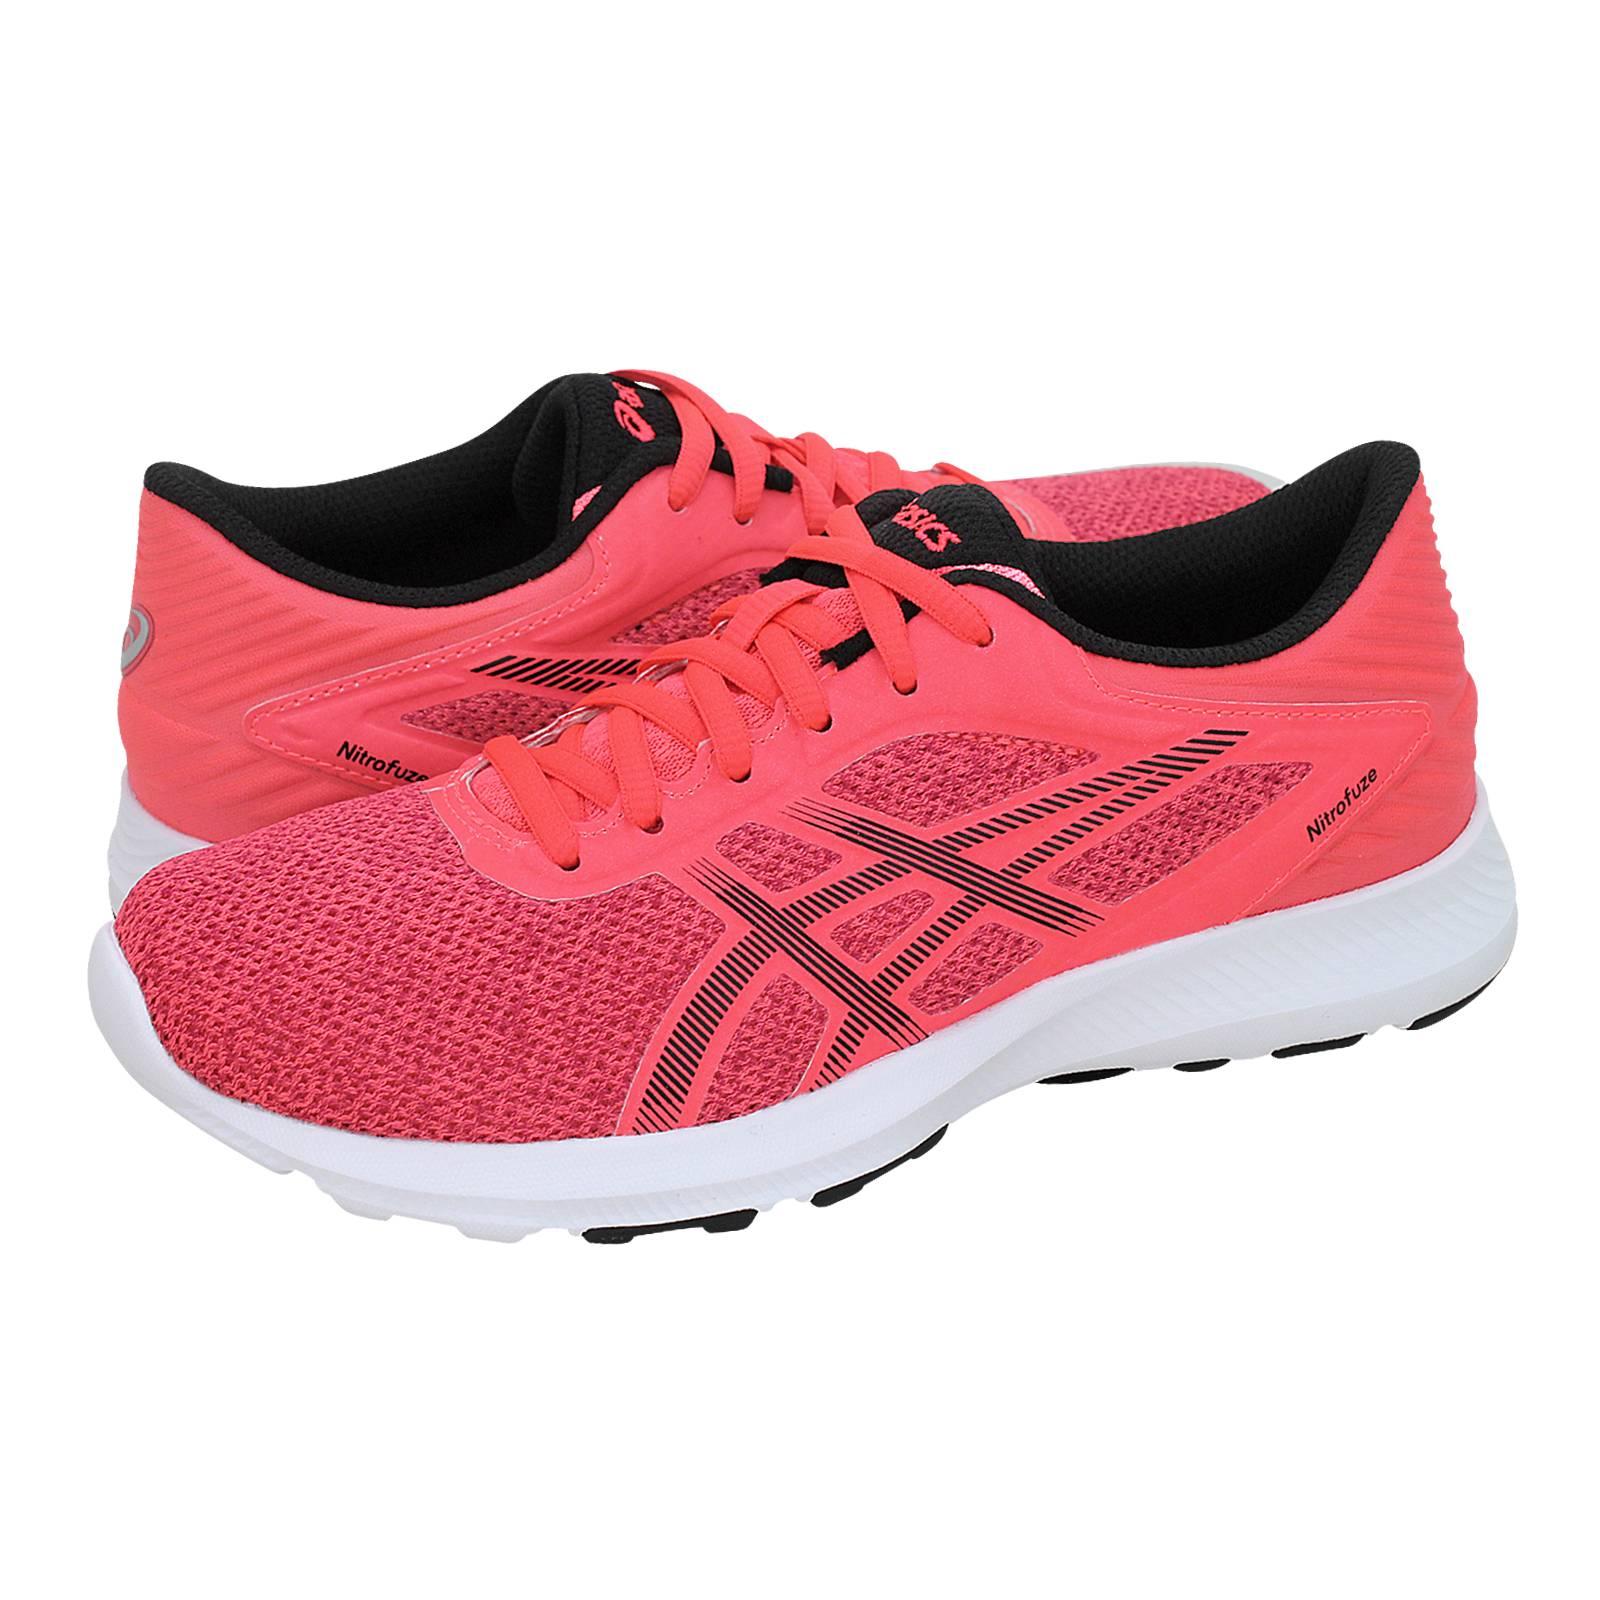 Nitrofuse - Γυναικεία αθλητικά παπούτσια Asics από υφασμα και ... 9896caddff6